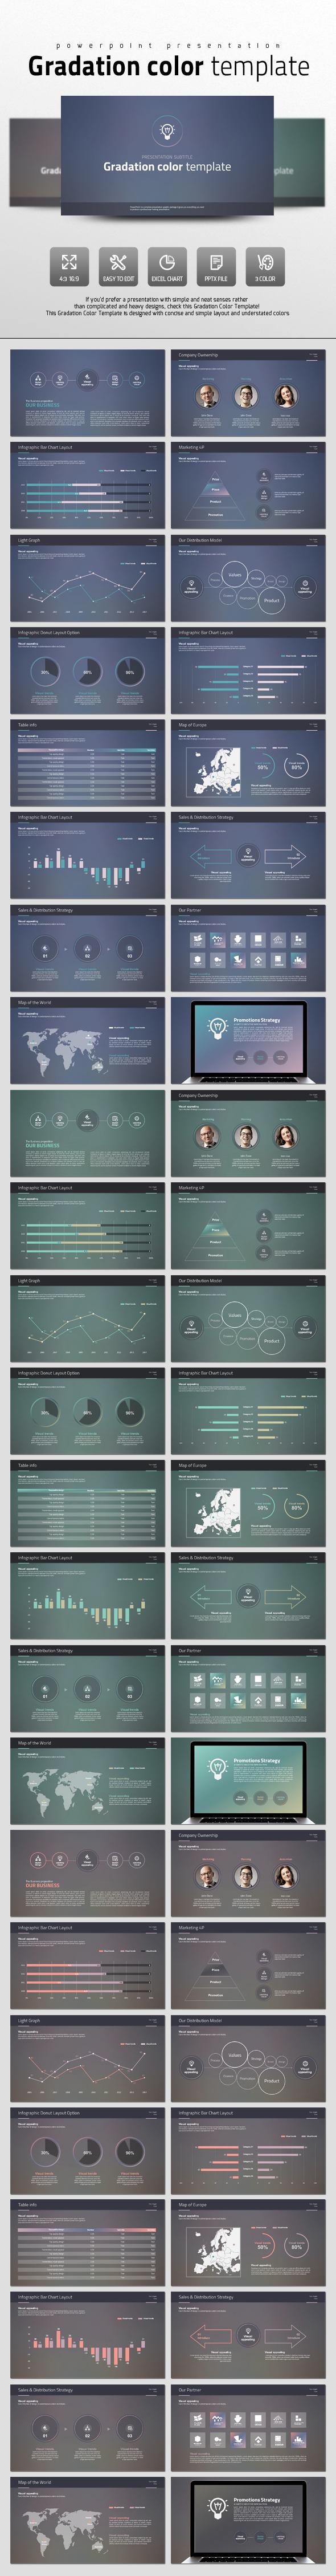 Gradation Color Template - PowerPoint Templates Presentation Templates